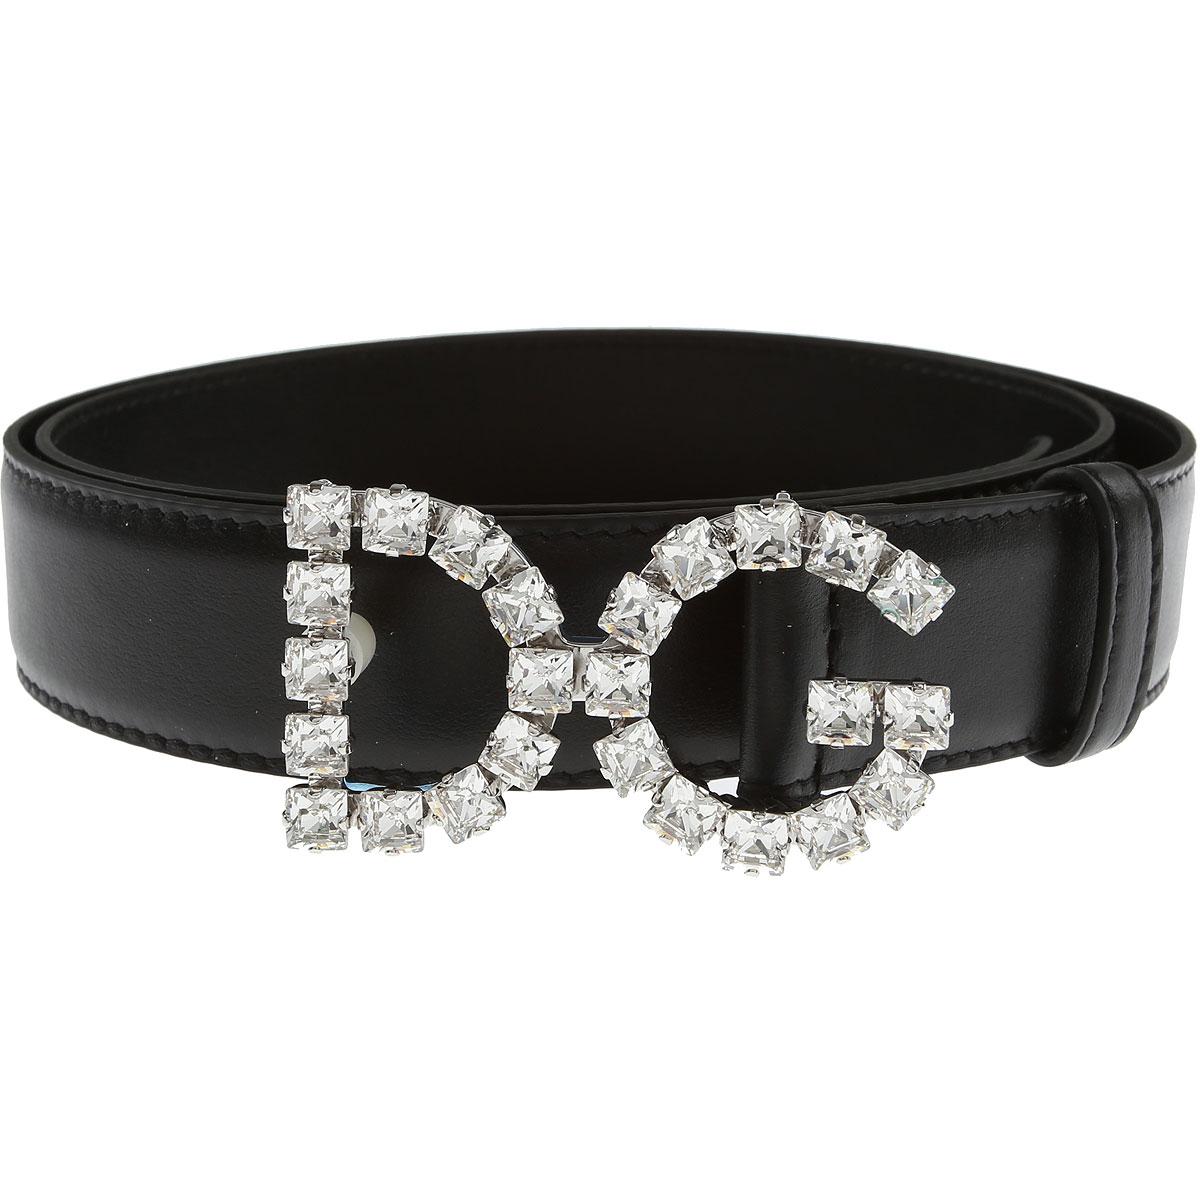 Dolce & Gabbana Womens Belts, Black, Leather, 2017, 32 inches - 80 cm 34 inches - 85 cm 36 inches - 90 cm 38 inches - 95 cm